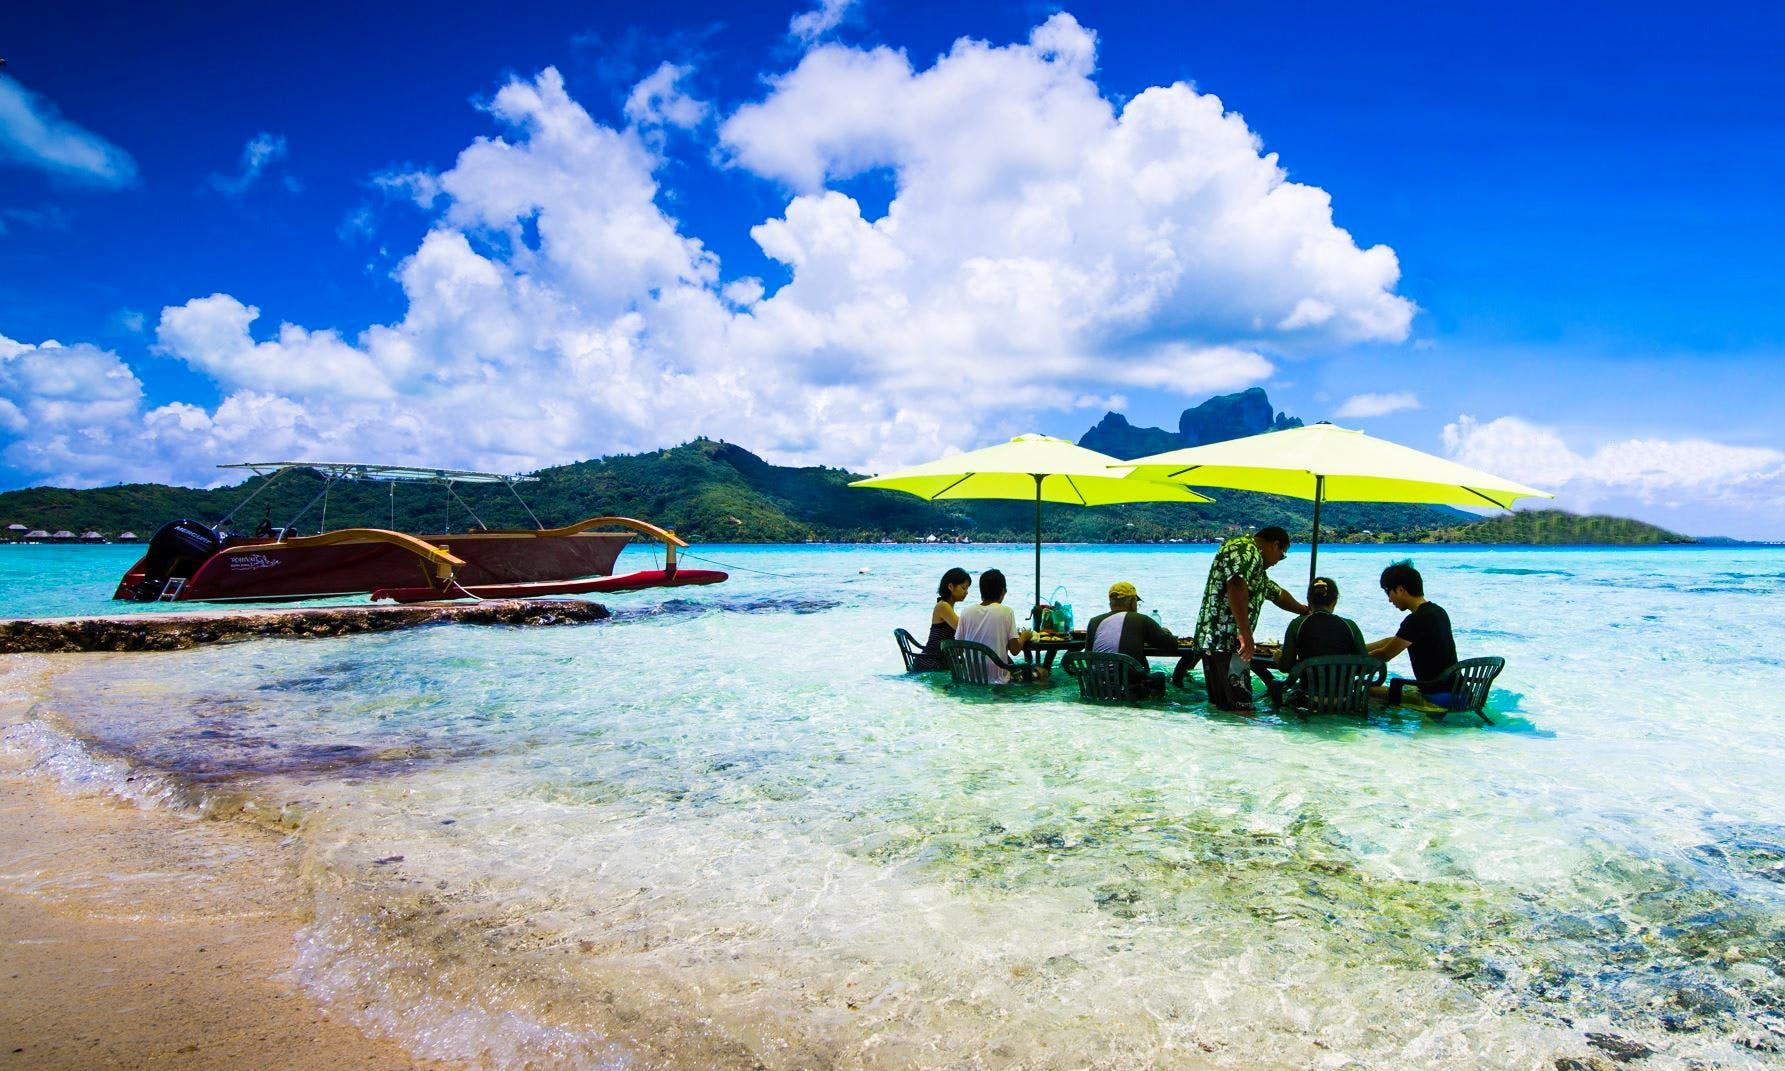 'Rohivai' Boat Day Tours in Nūnu'e